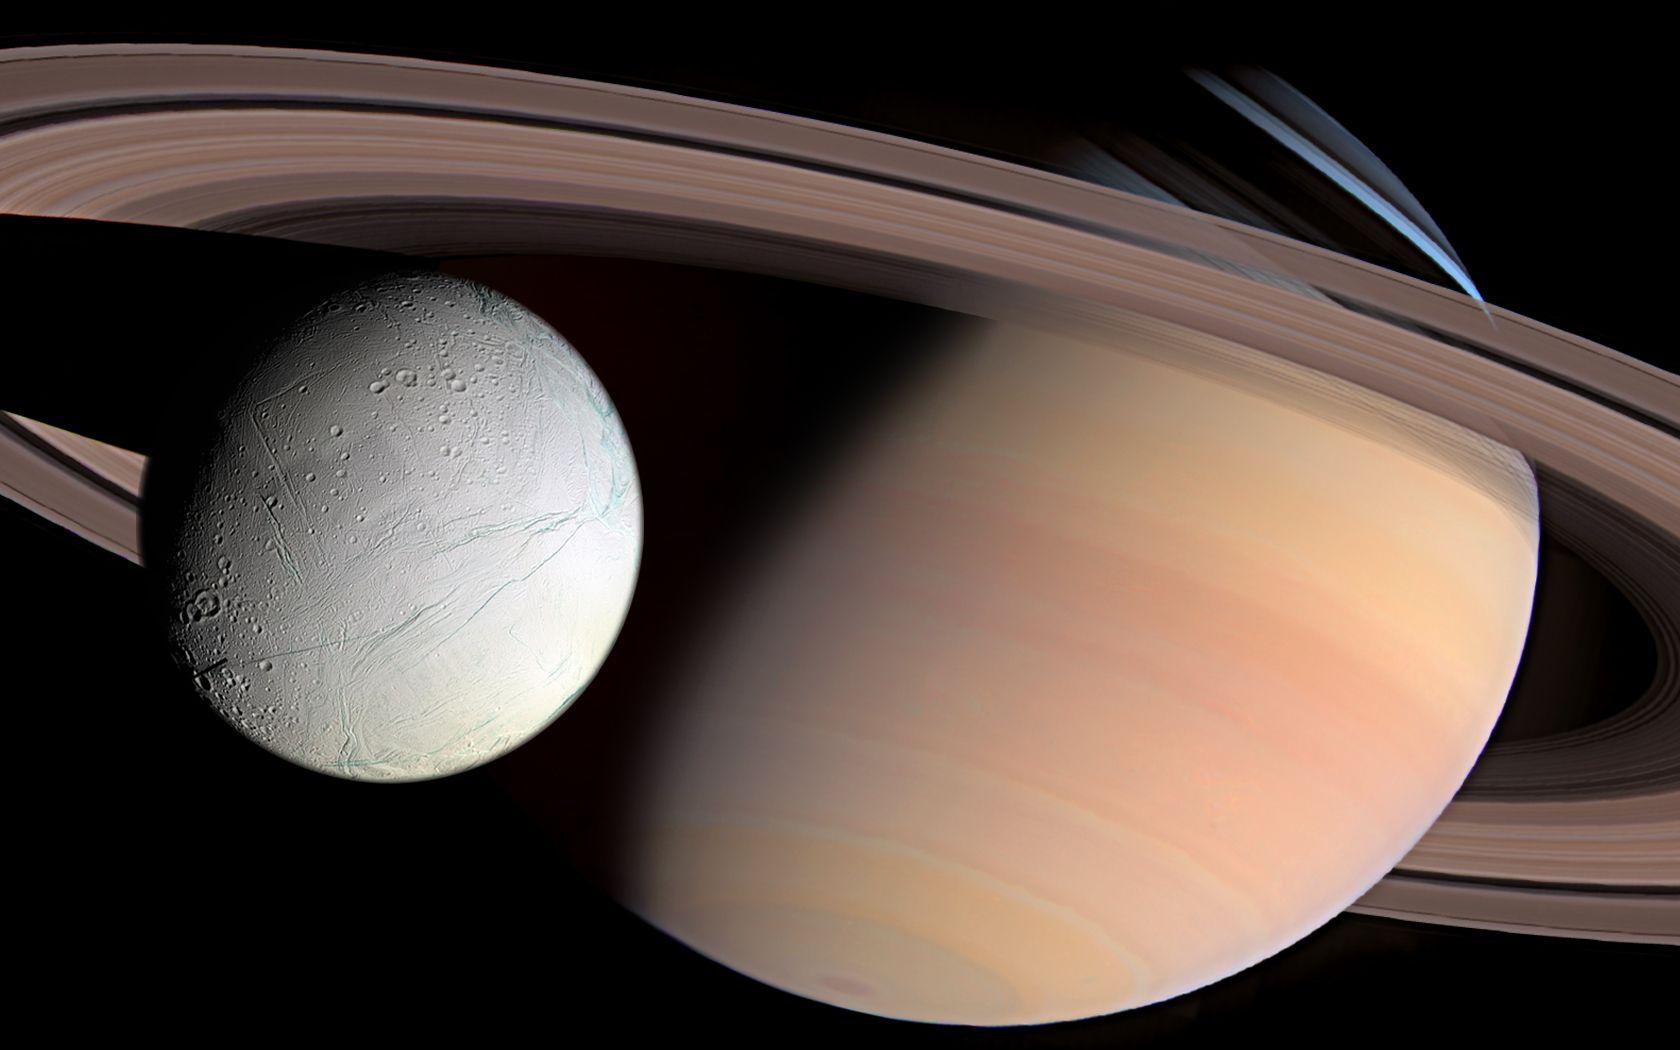 Nasa Iphone 5 Wallpaper Enceladus Wallpaper And Background Image 1680x1050 Id